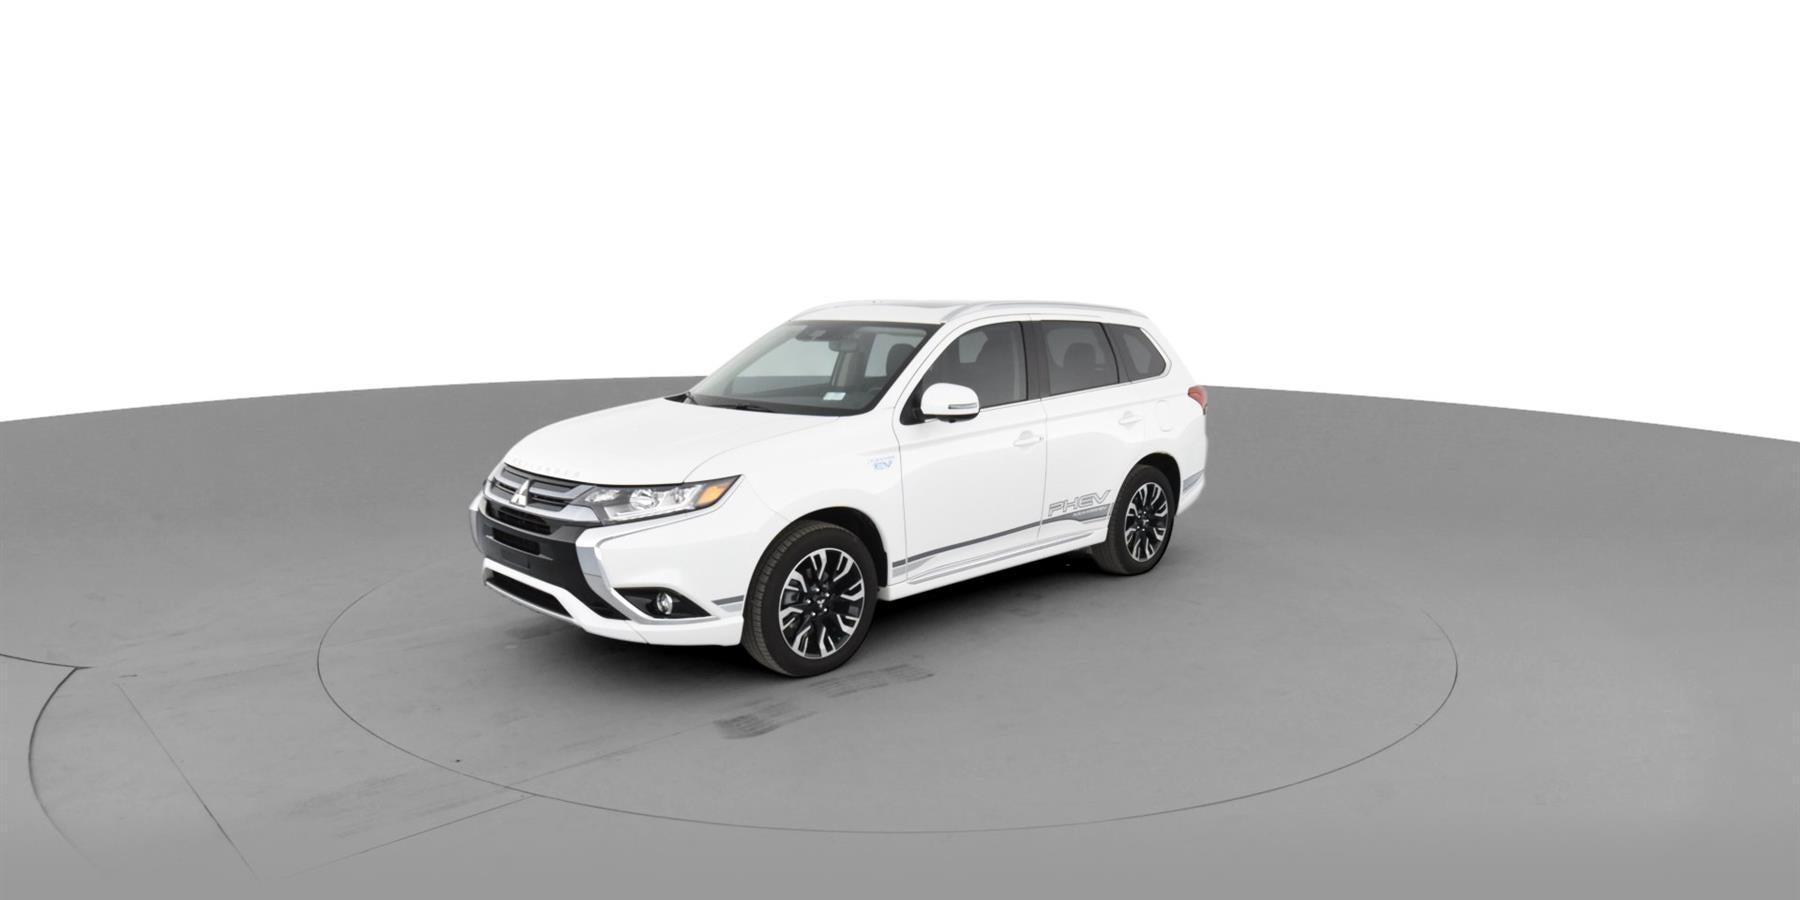 2018 Mitsubishi Outlander Phev Gt Sport Utility 4d For Sale Carvana